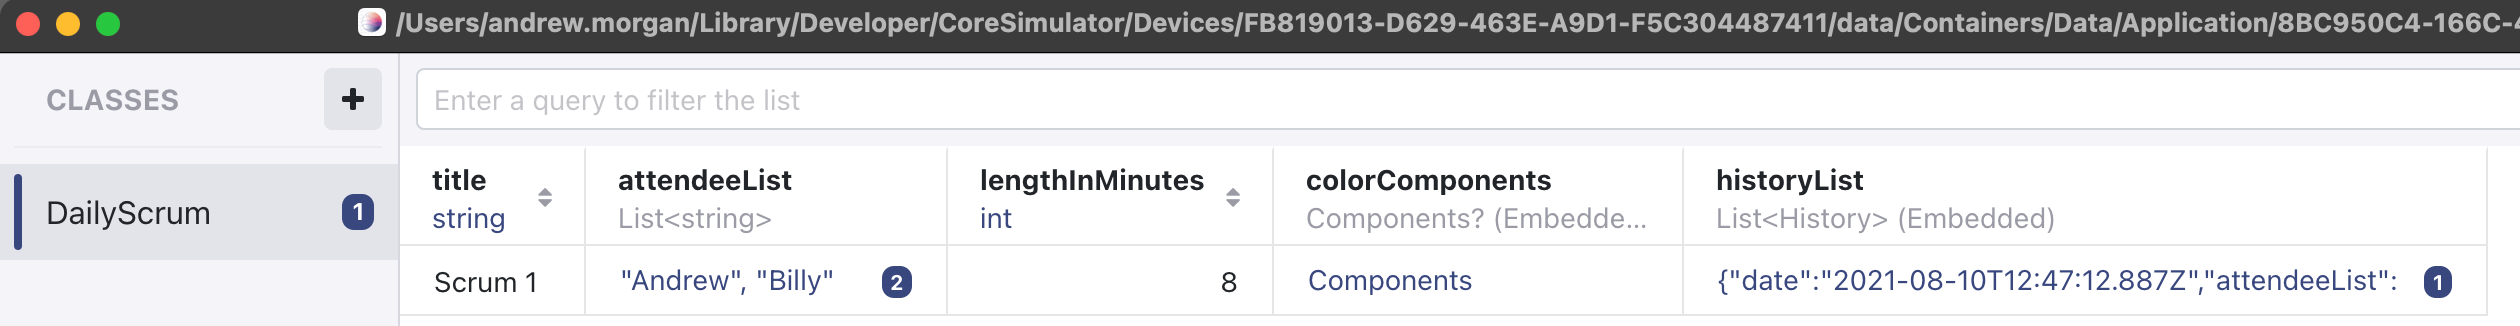 DailyScrum data shown in RealmStudio